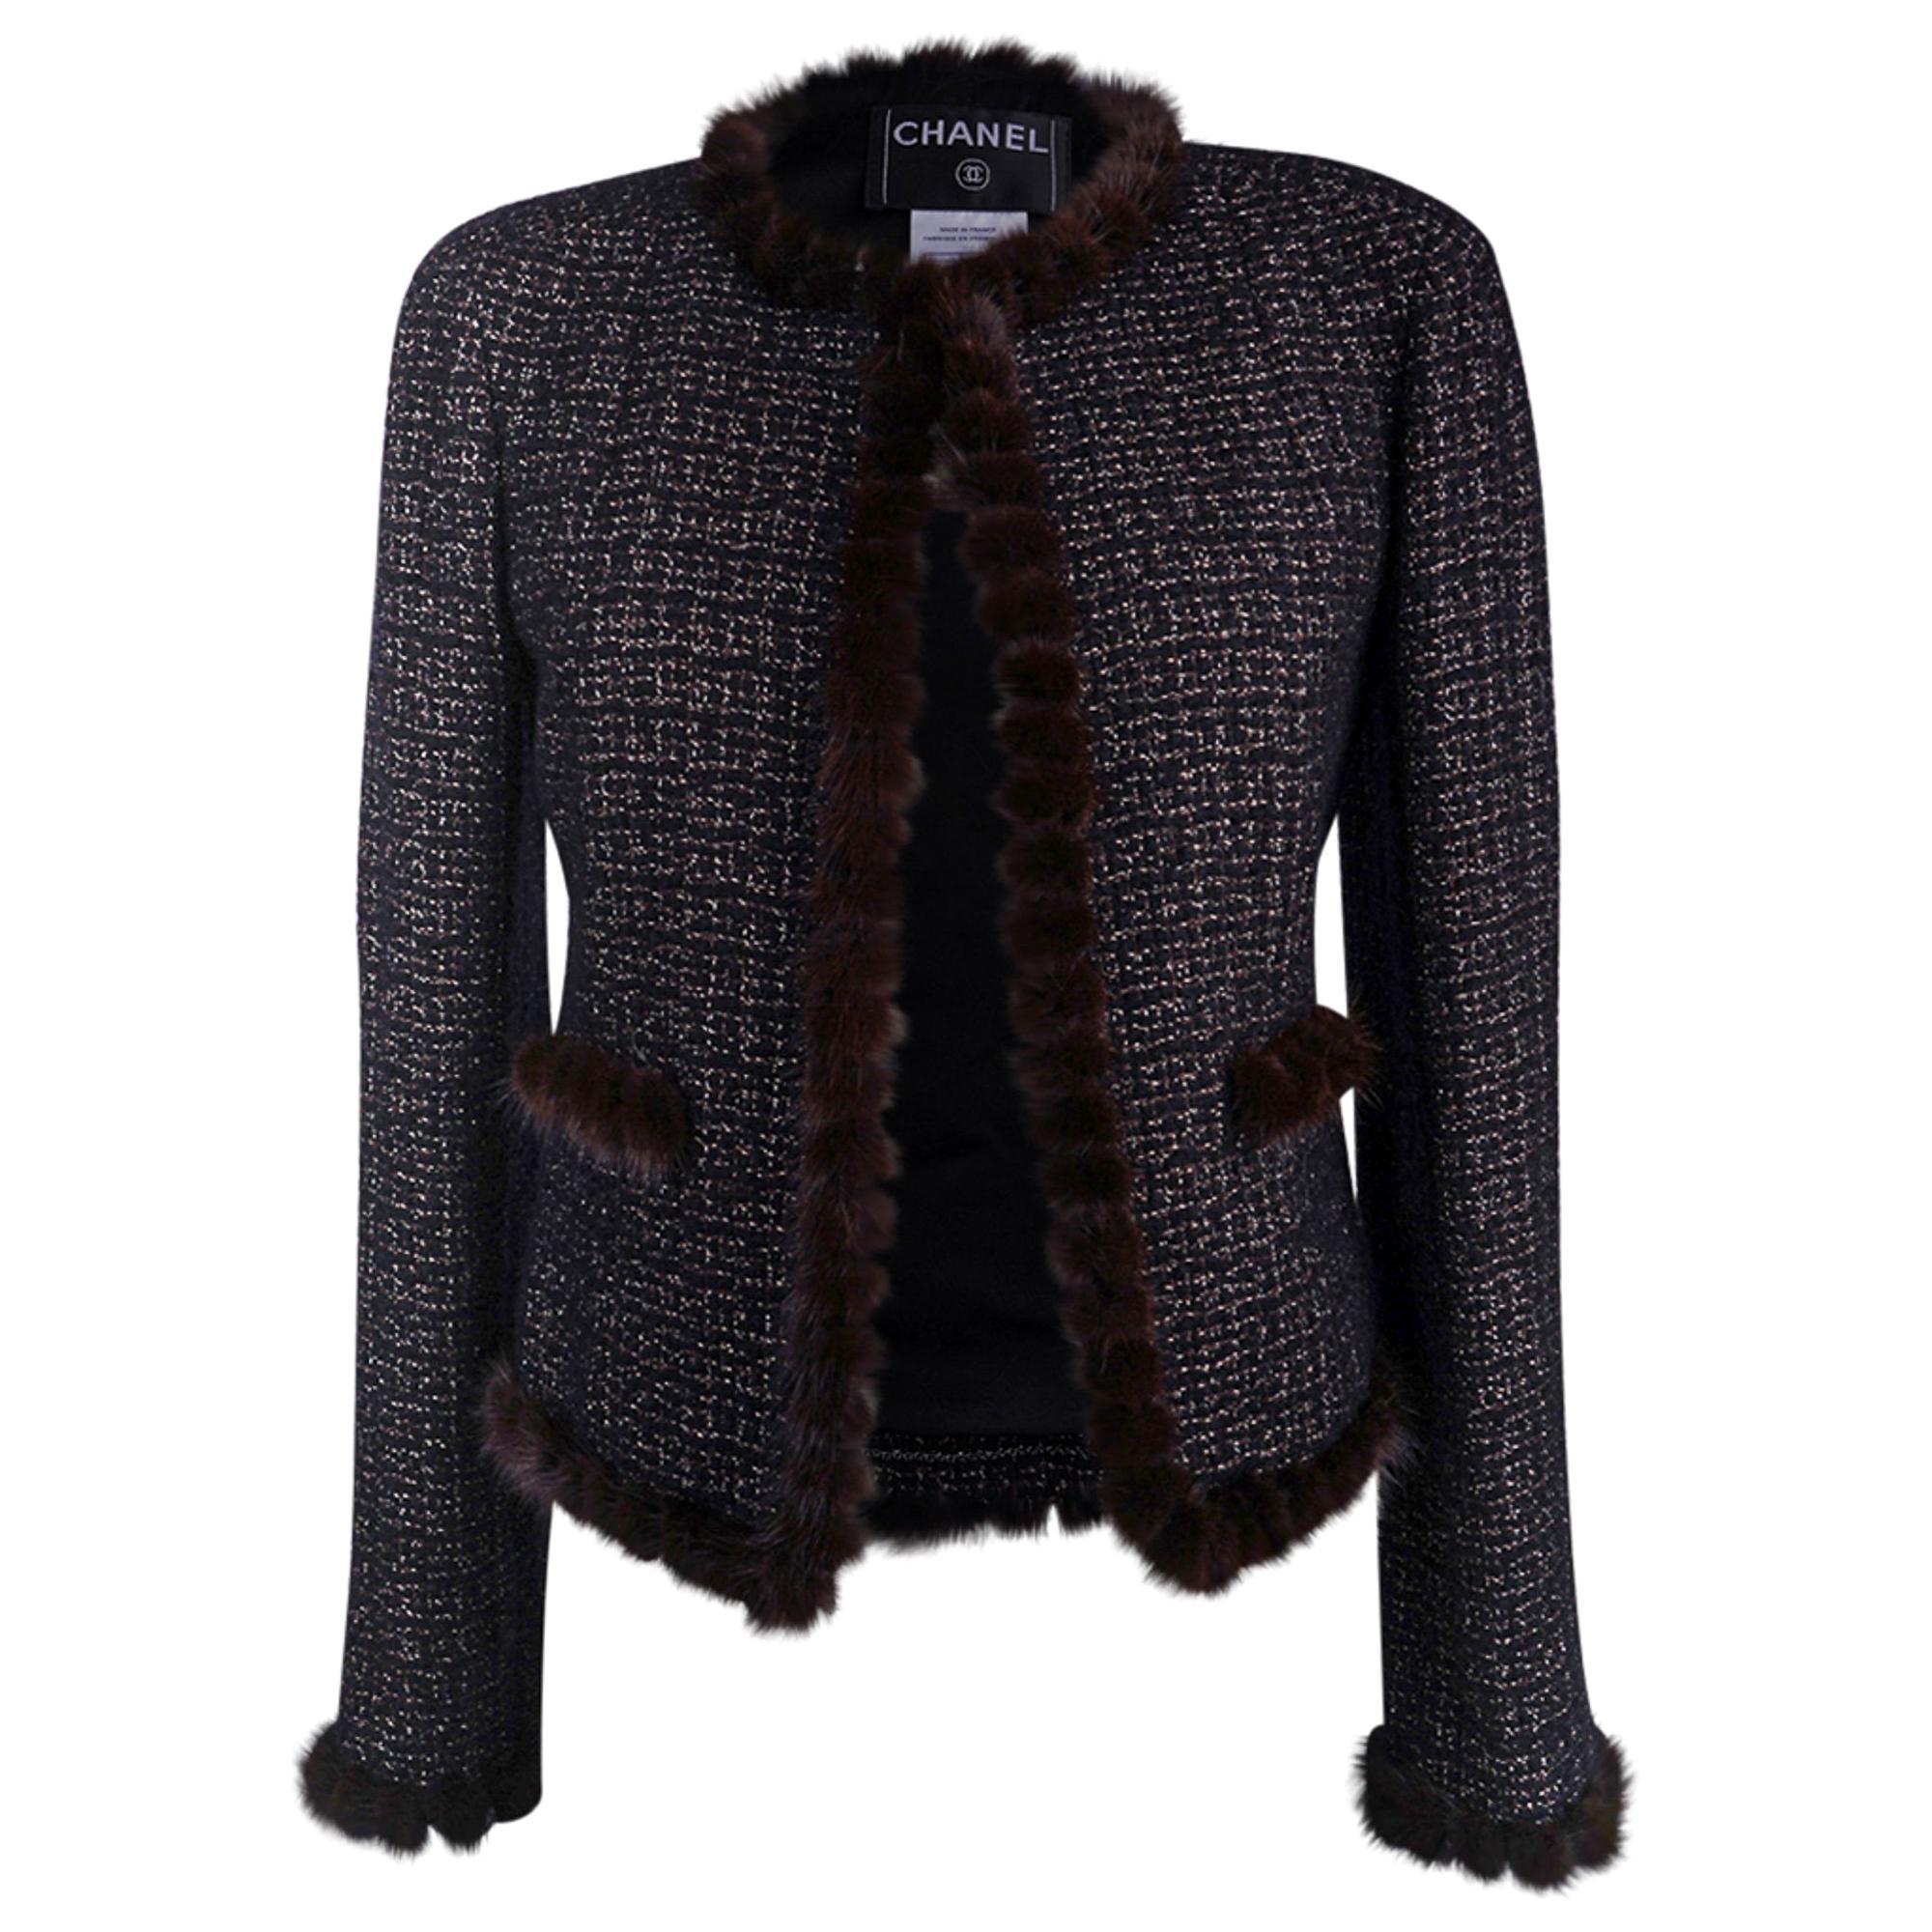 Chanel 03A Jacket Black Tweed Mink Trim Metallic Thread 40 / 6